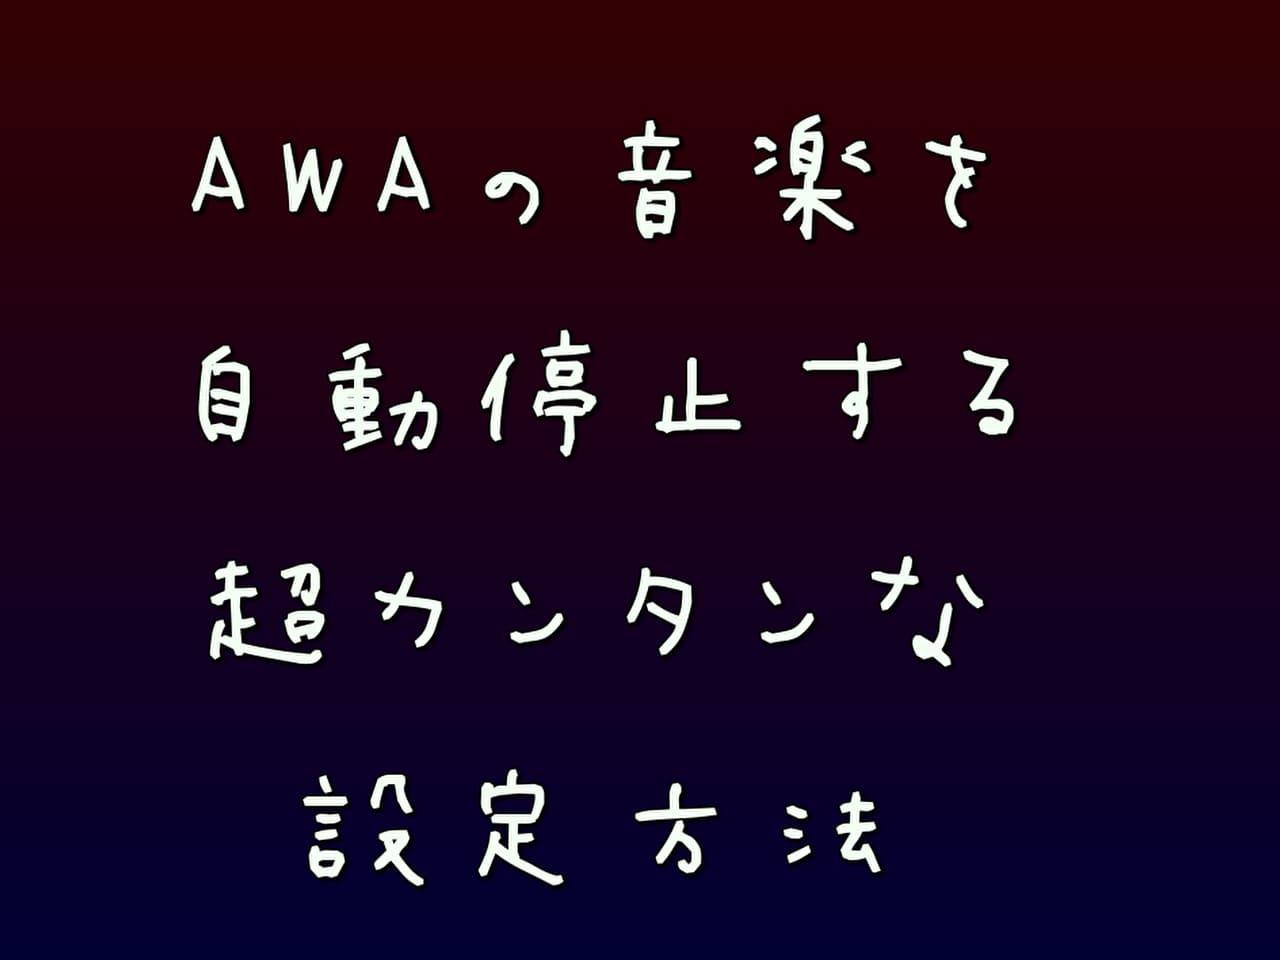 AWAの音楽を自動停止する超カンタンな設定方法【スリープタイマー】